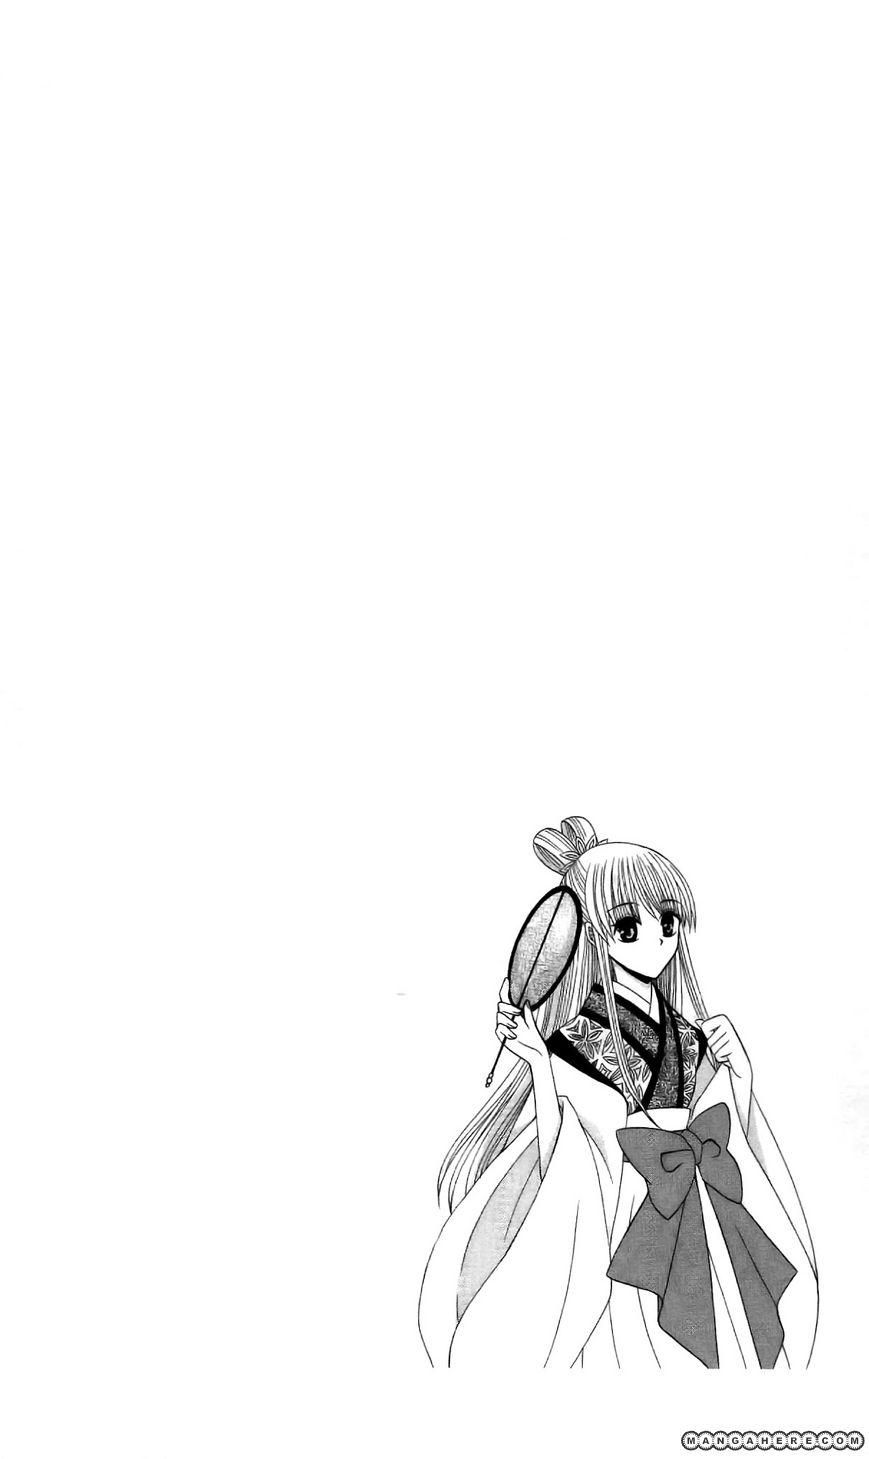 Ookami-heika no Hanayome 10 Page 2